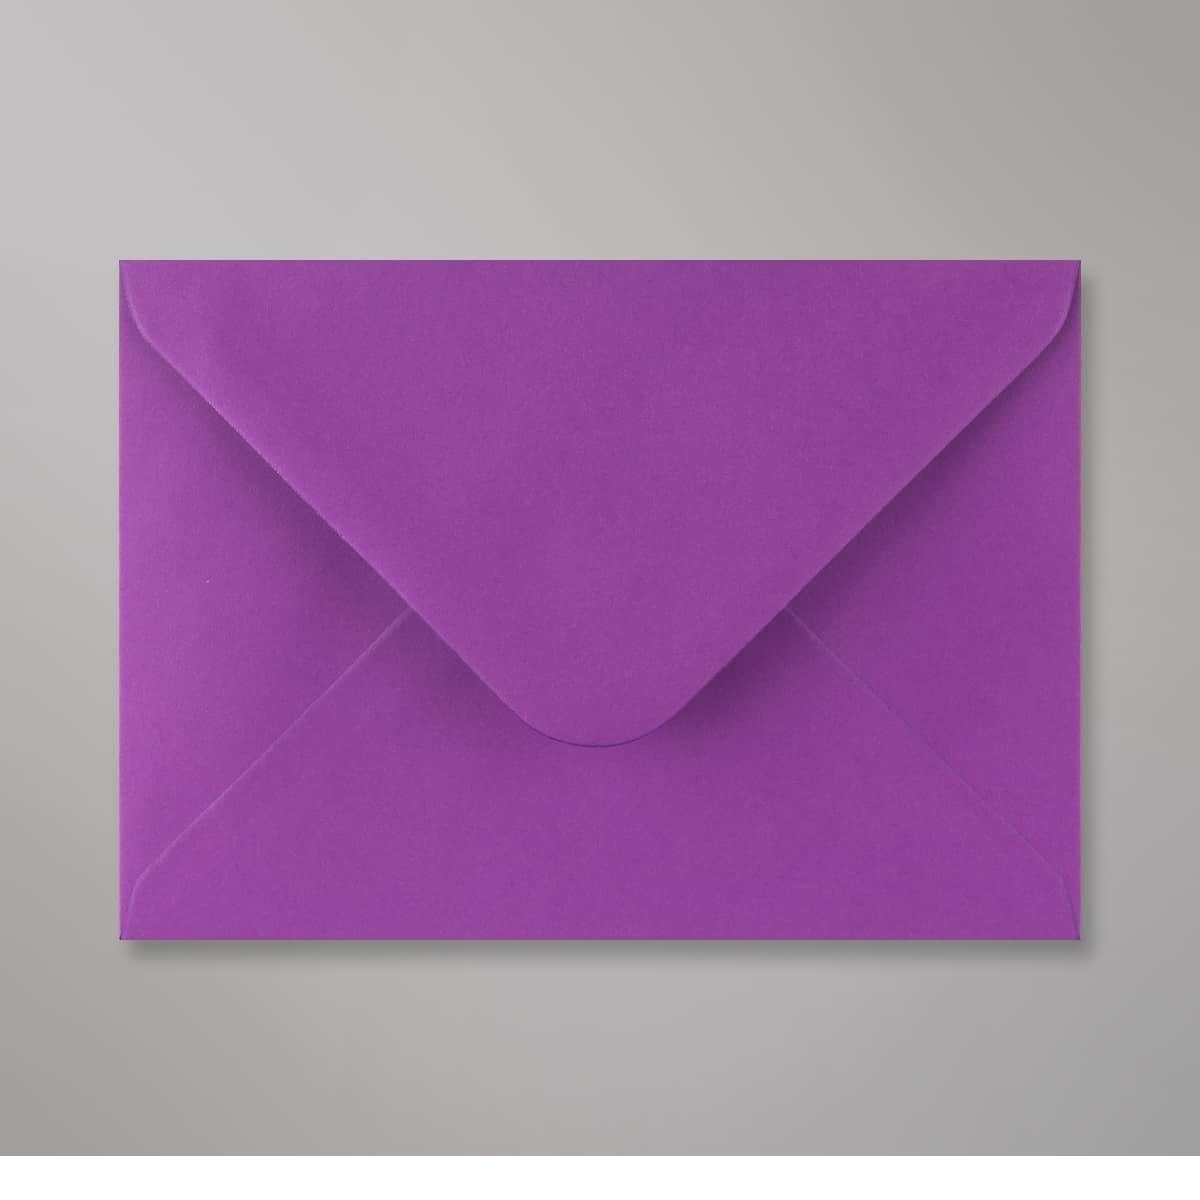 Enveloppe violette 133x184 mm